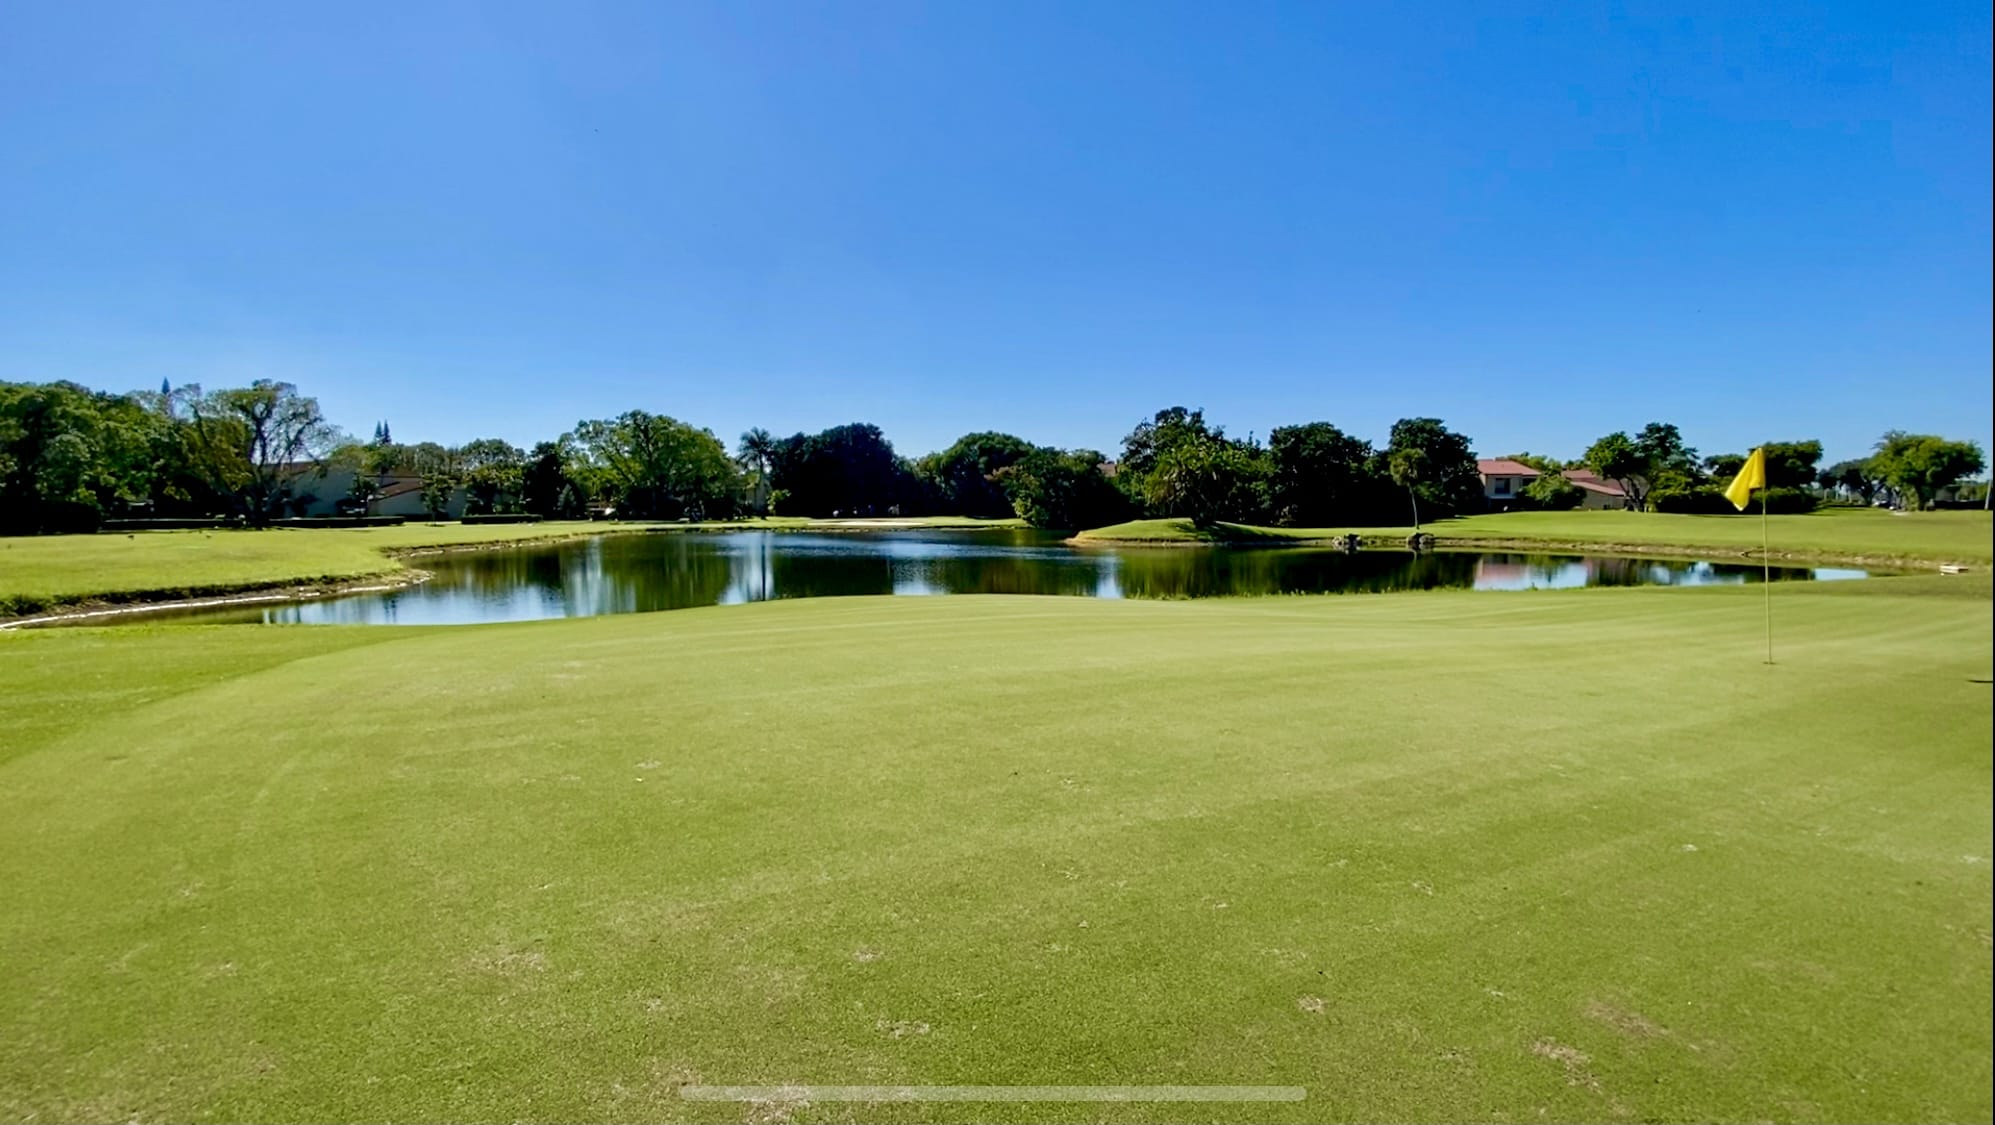 Hole 5 at Costa Del Sol Golf Club